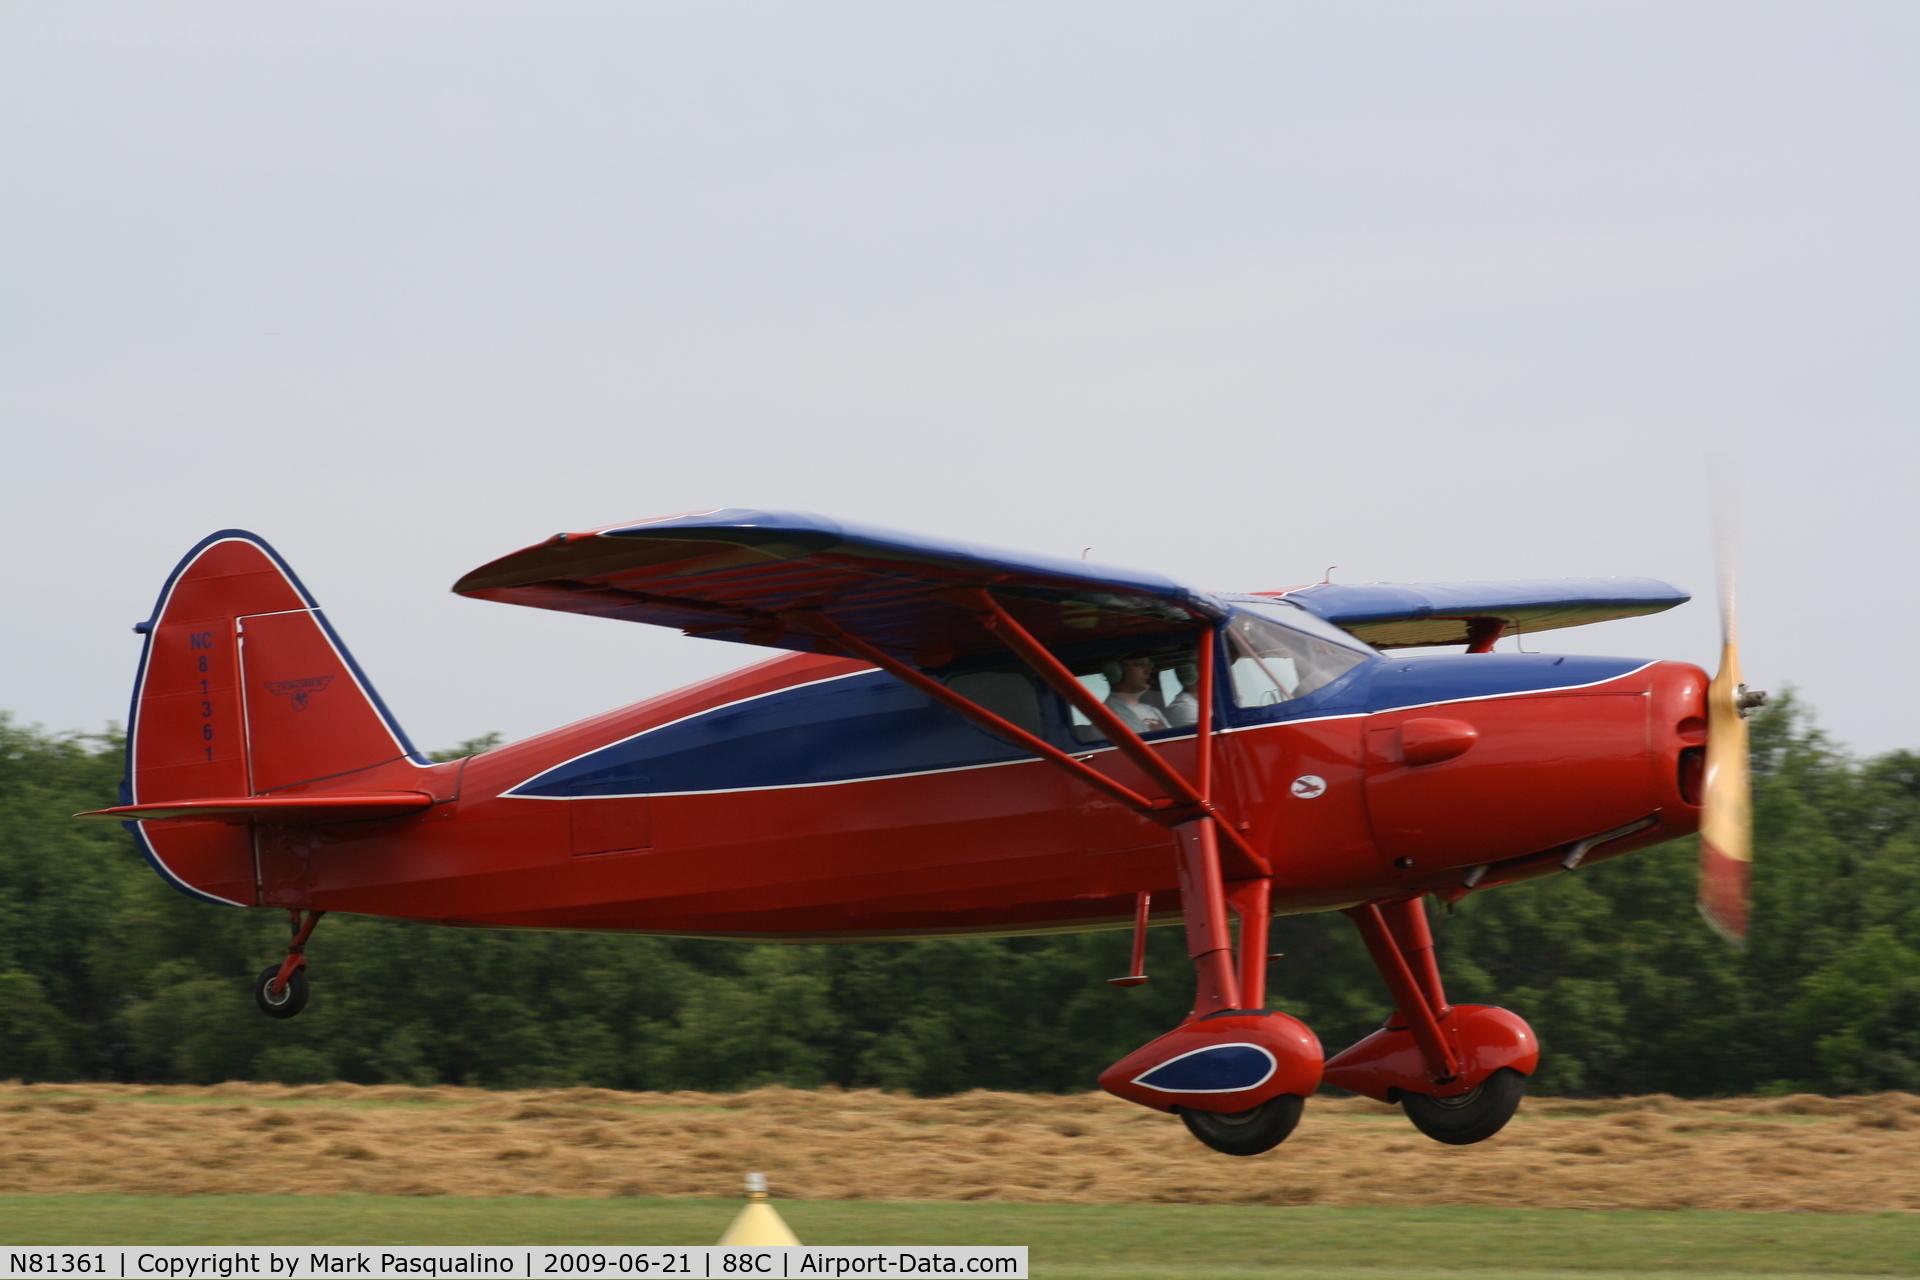 N81361, 1946 Fairchild 24R-46 C/N R46261, Fairchild 24R-46